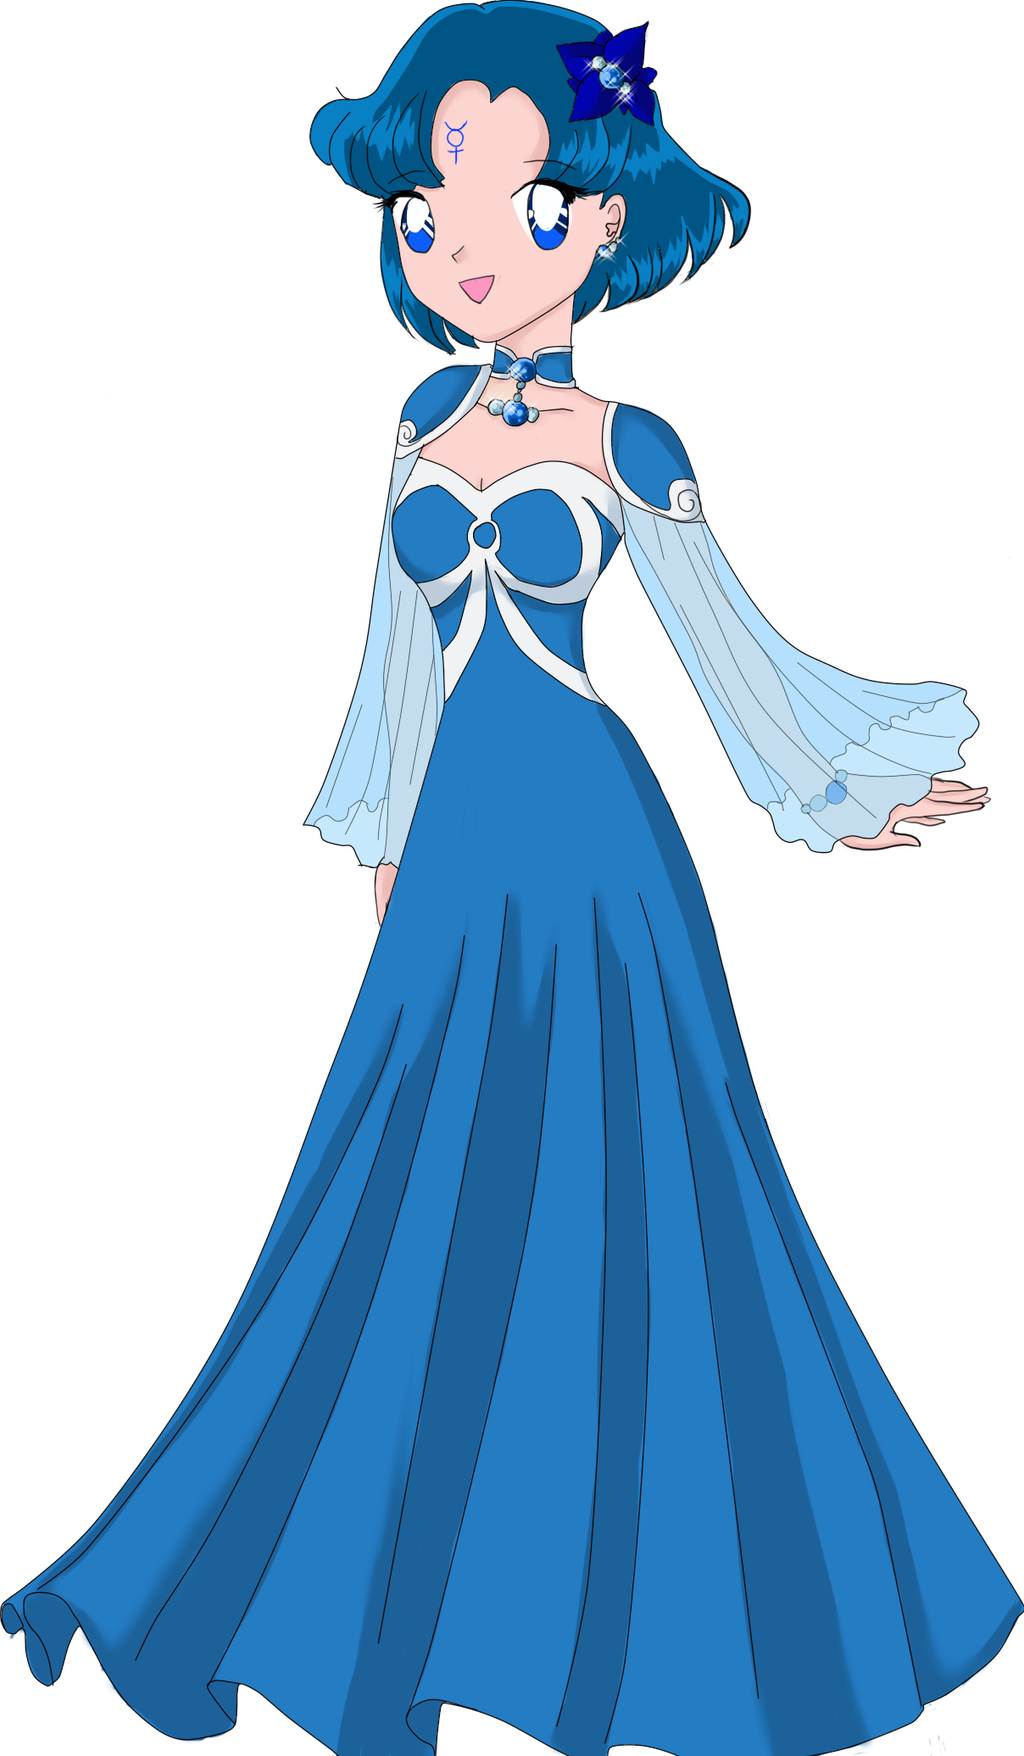 Princess Mercury By Limetiger711 On Deviantart How To Draw A Disney Princess Dress Free Coloring Sheets